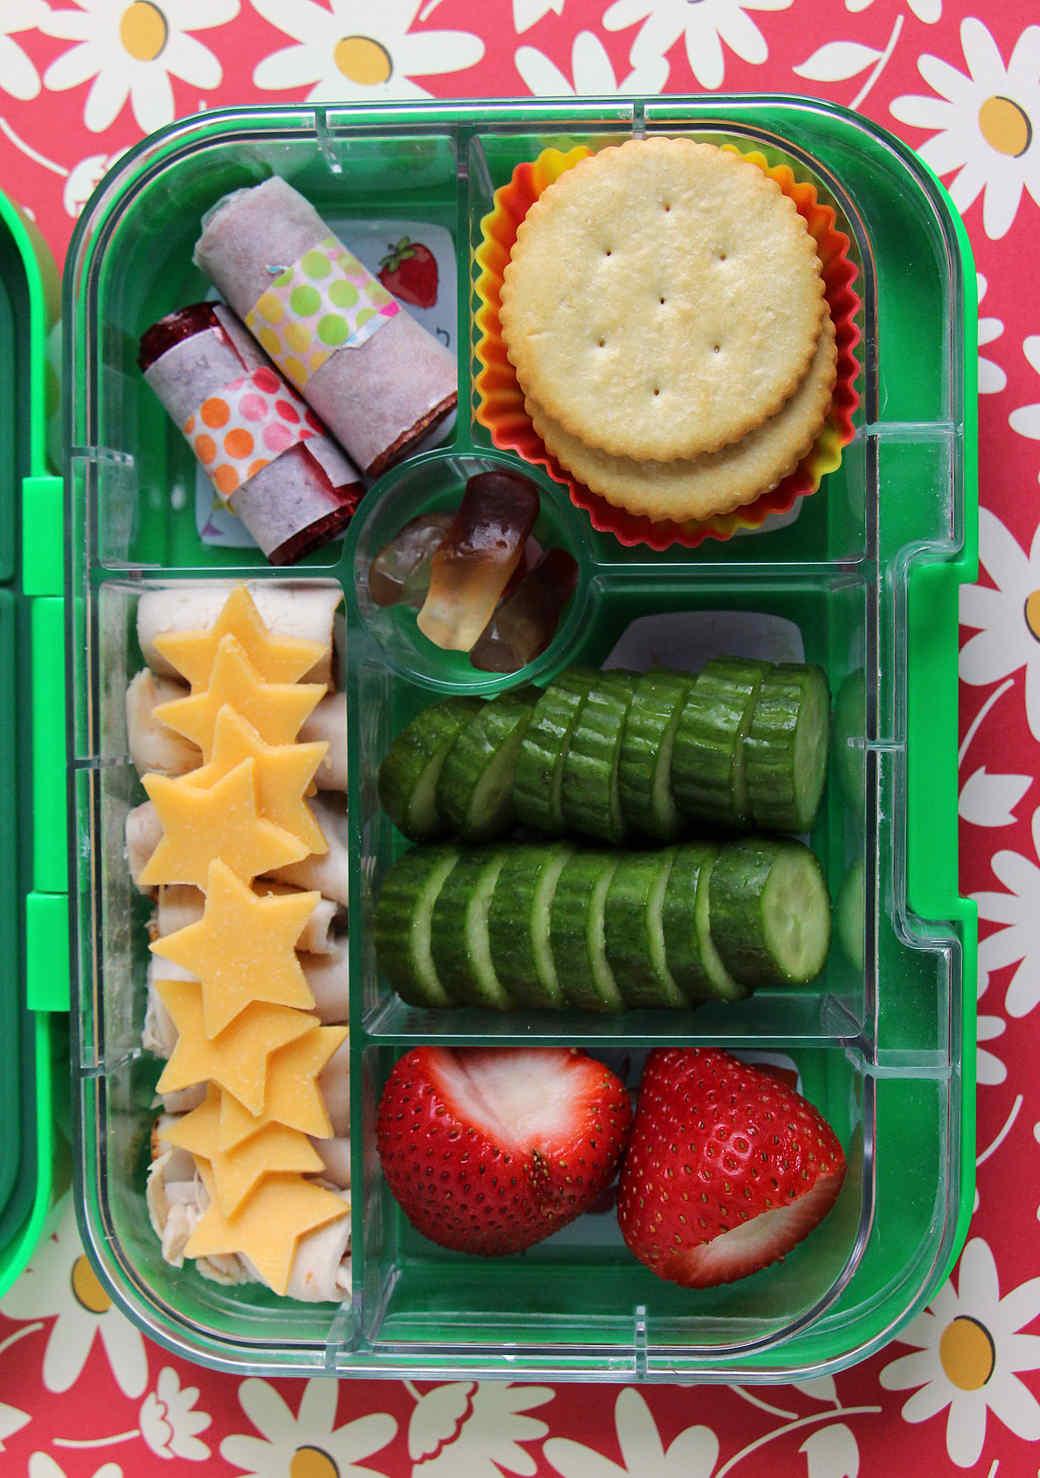 better-lunchables-nut-free-lunch.jpg (skyword:335873)